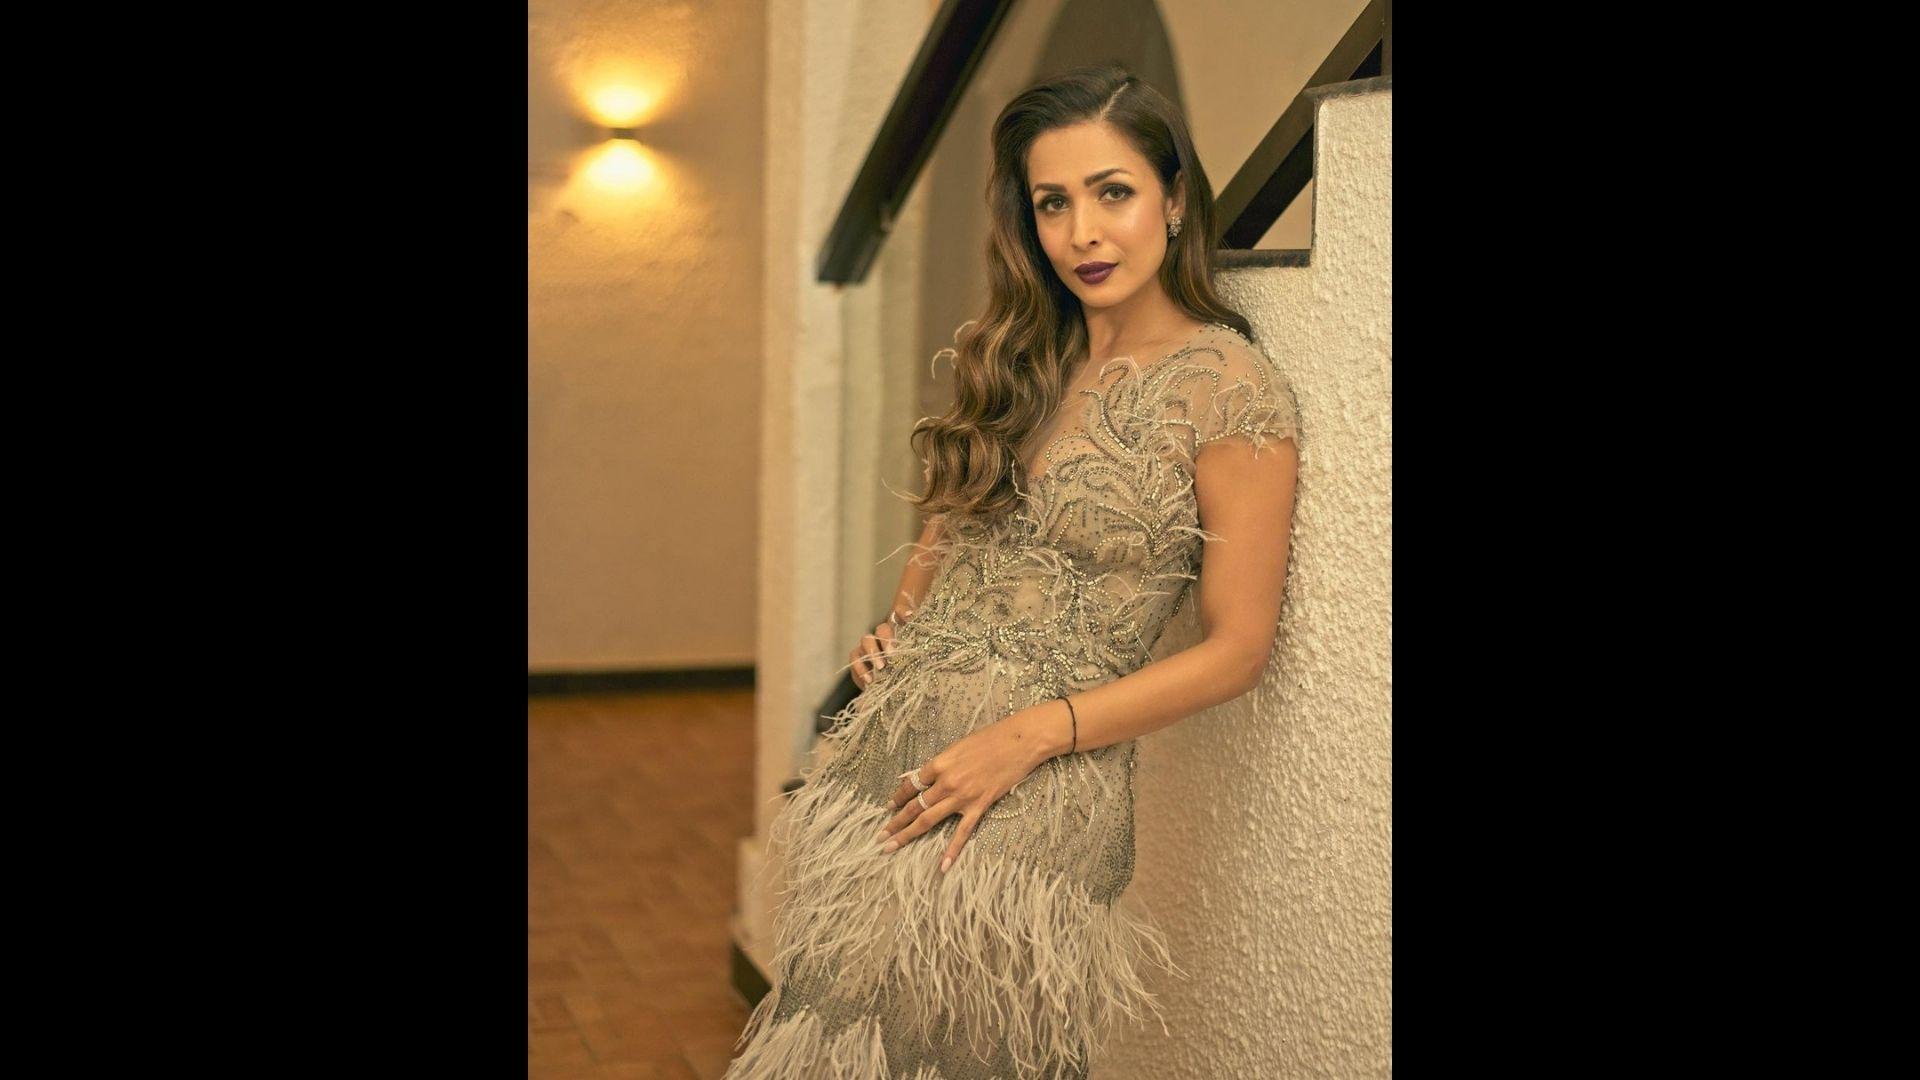 Malaika Arora Twerks On A Latin Song With Her Dance Partner; No It's Not Her Beau Arjun Kapoor – Video Inside